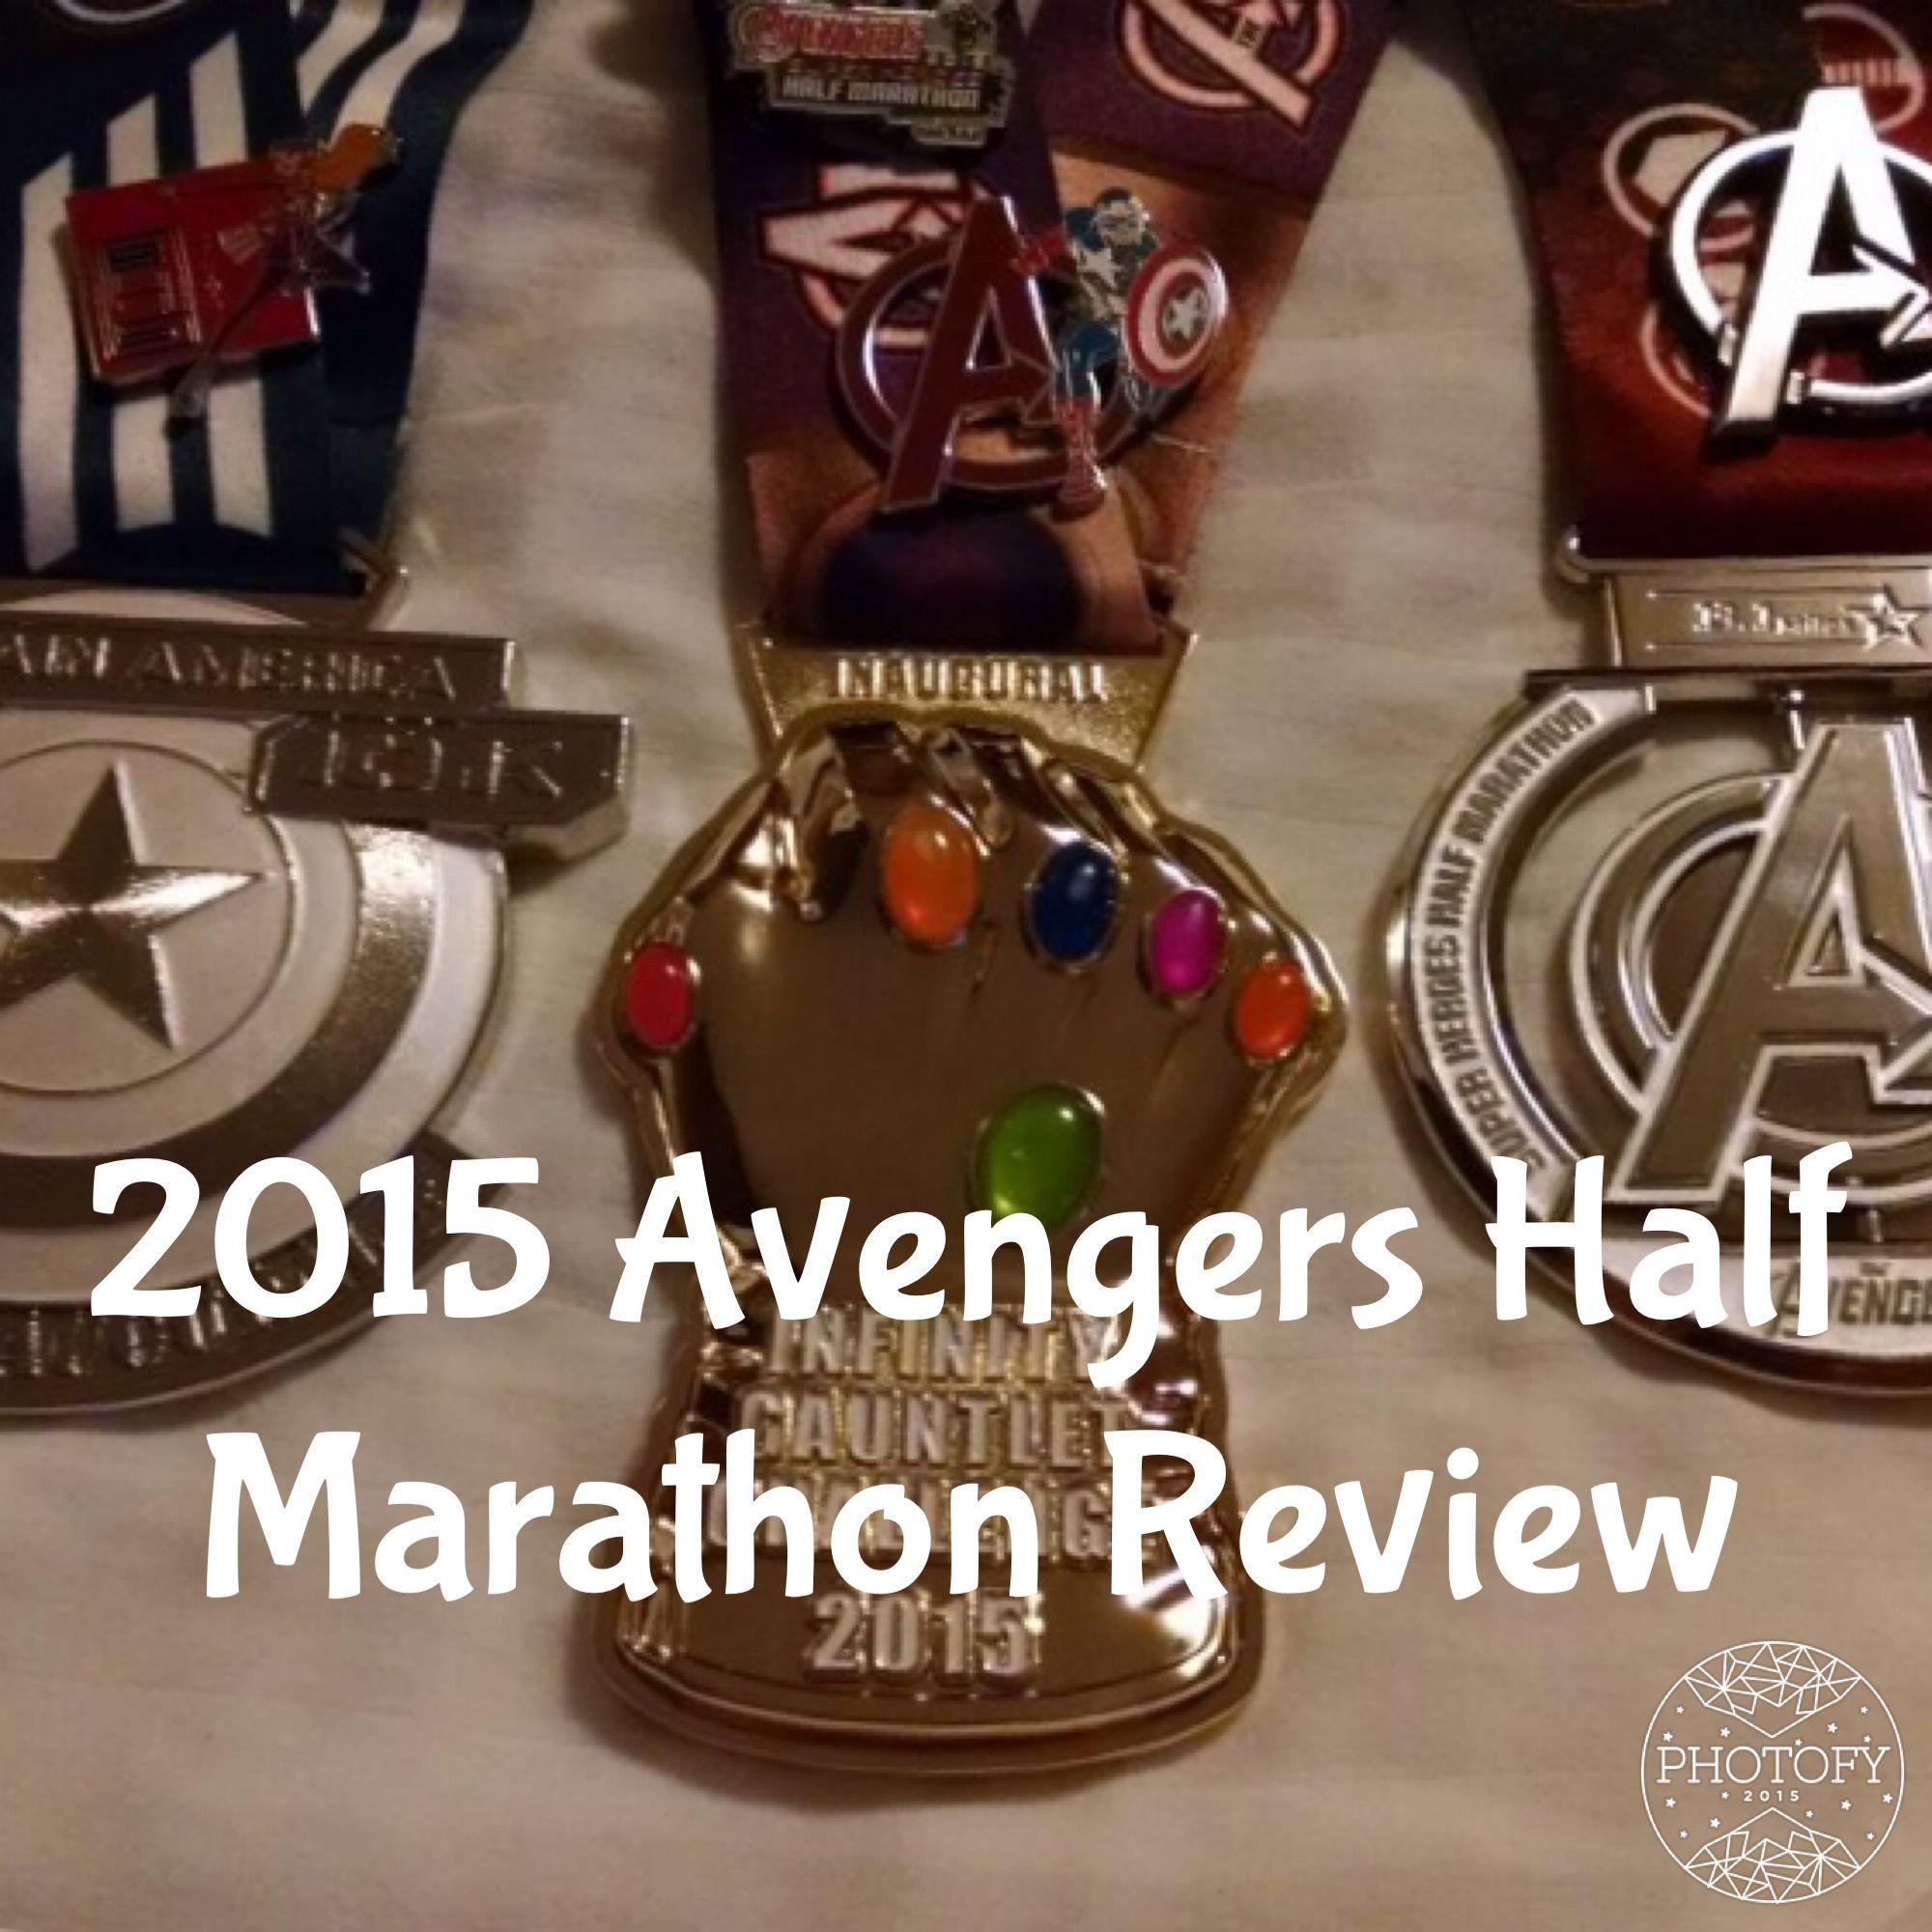 Casual Runner's 2015 Review of RunDisney's Avengers Half Marathon #run #rundisney #disneyland #californiaadventure #anaheim #avengers #cosrunning #13point1 #halfmarathon #half